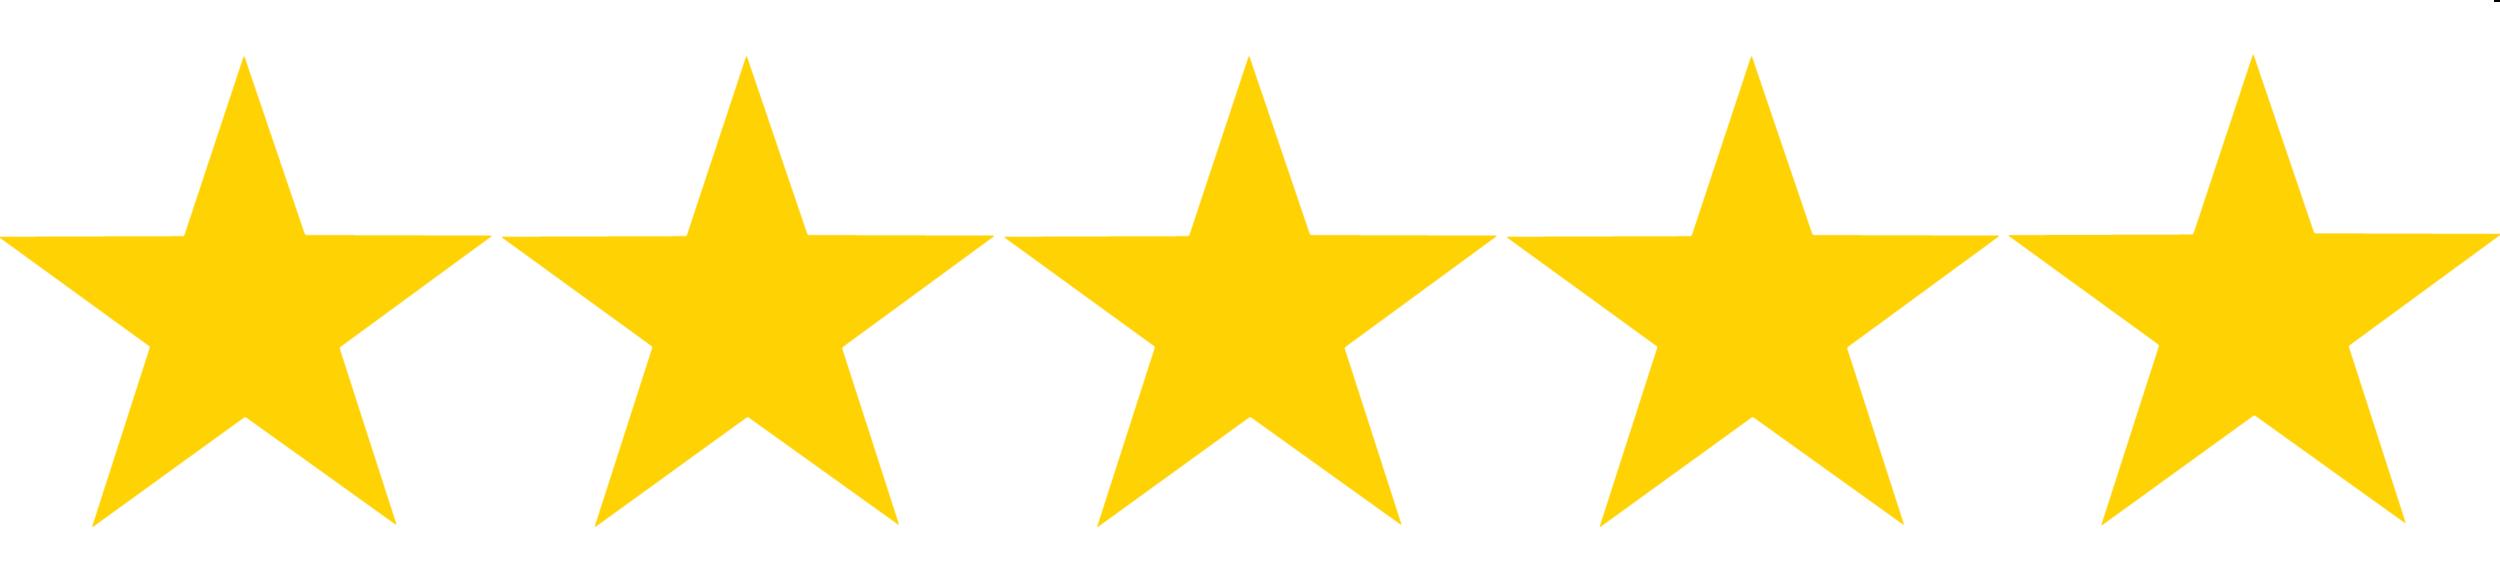 5 Star specialist Endodontist London